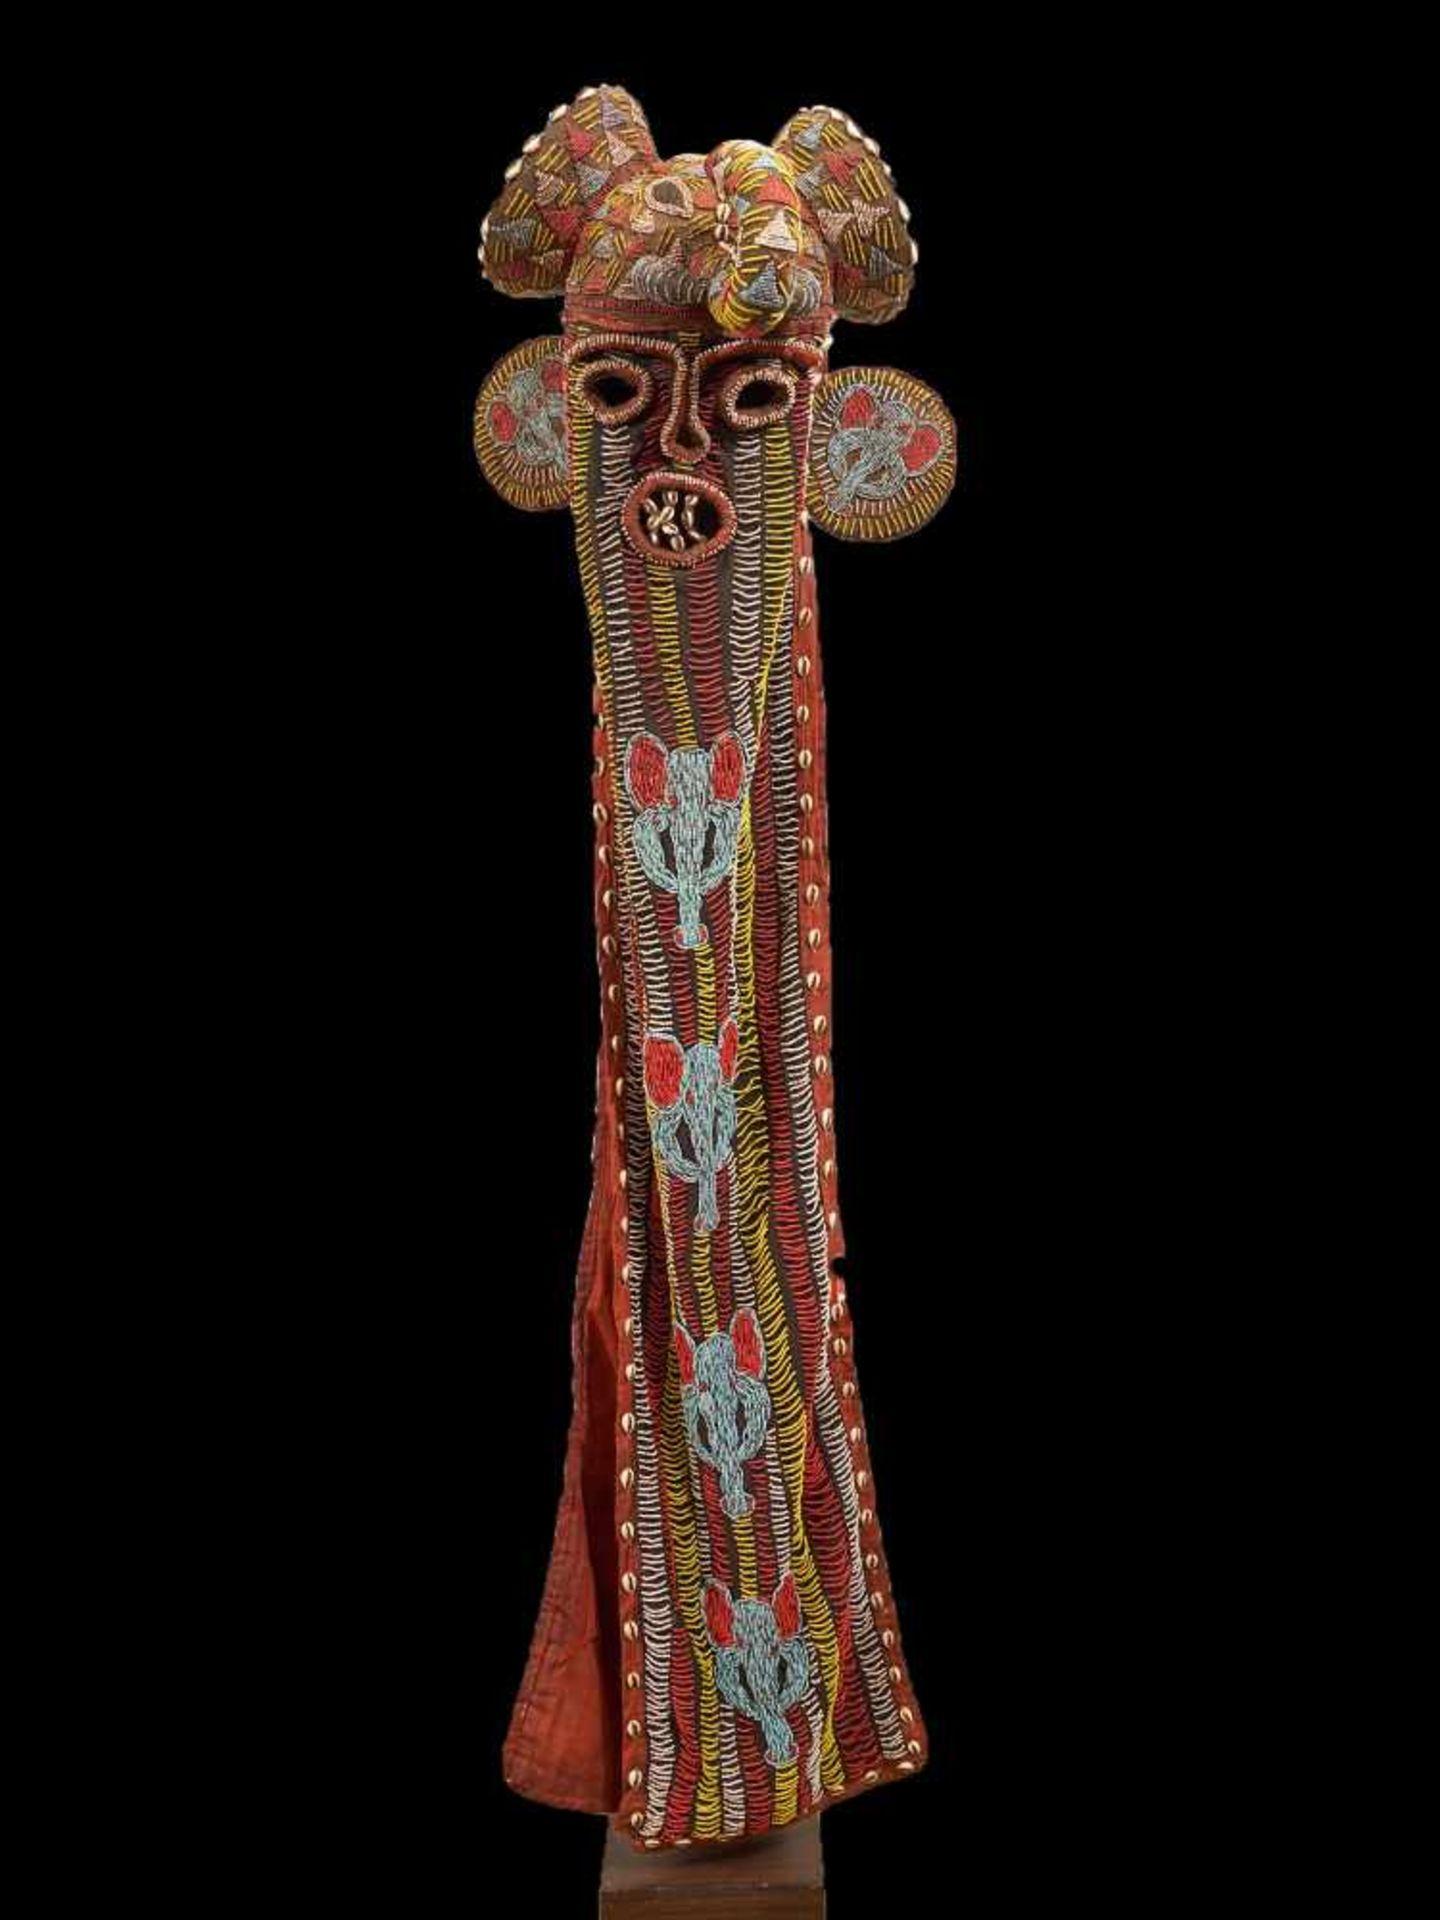 Beaded Elephant Mask, Grassland People, Cameroon - Tribal ArtDescription: The mask has been